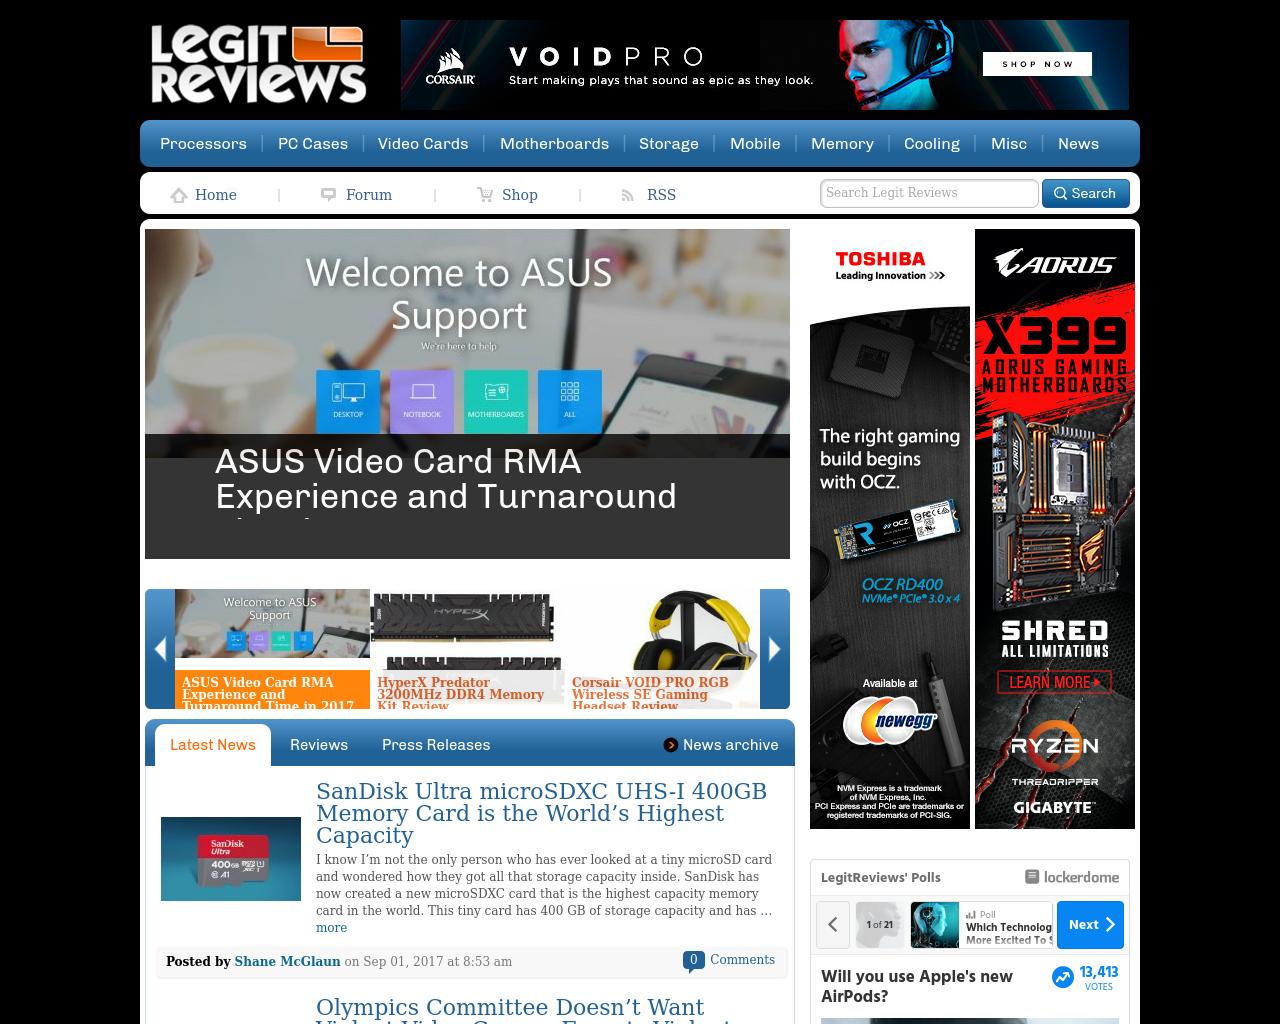 Legit-Reviews-Advertising-Reviews-Pricing